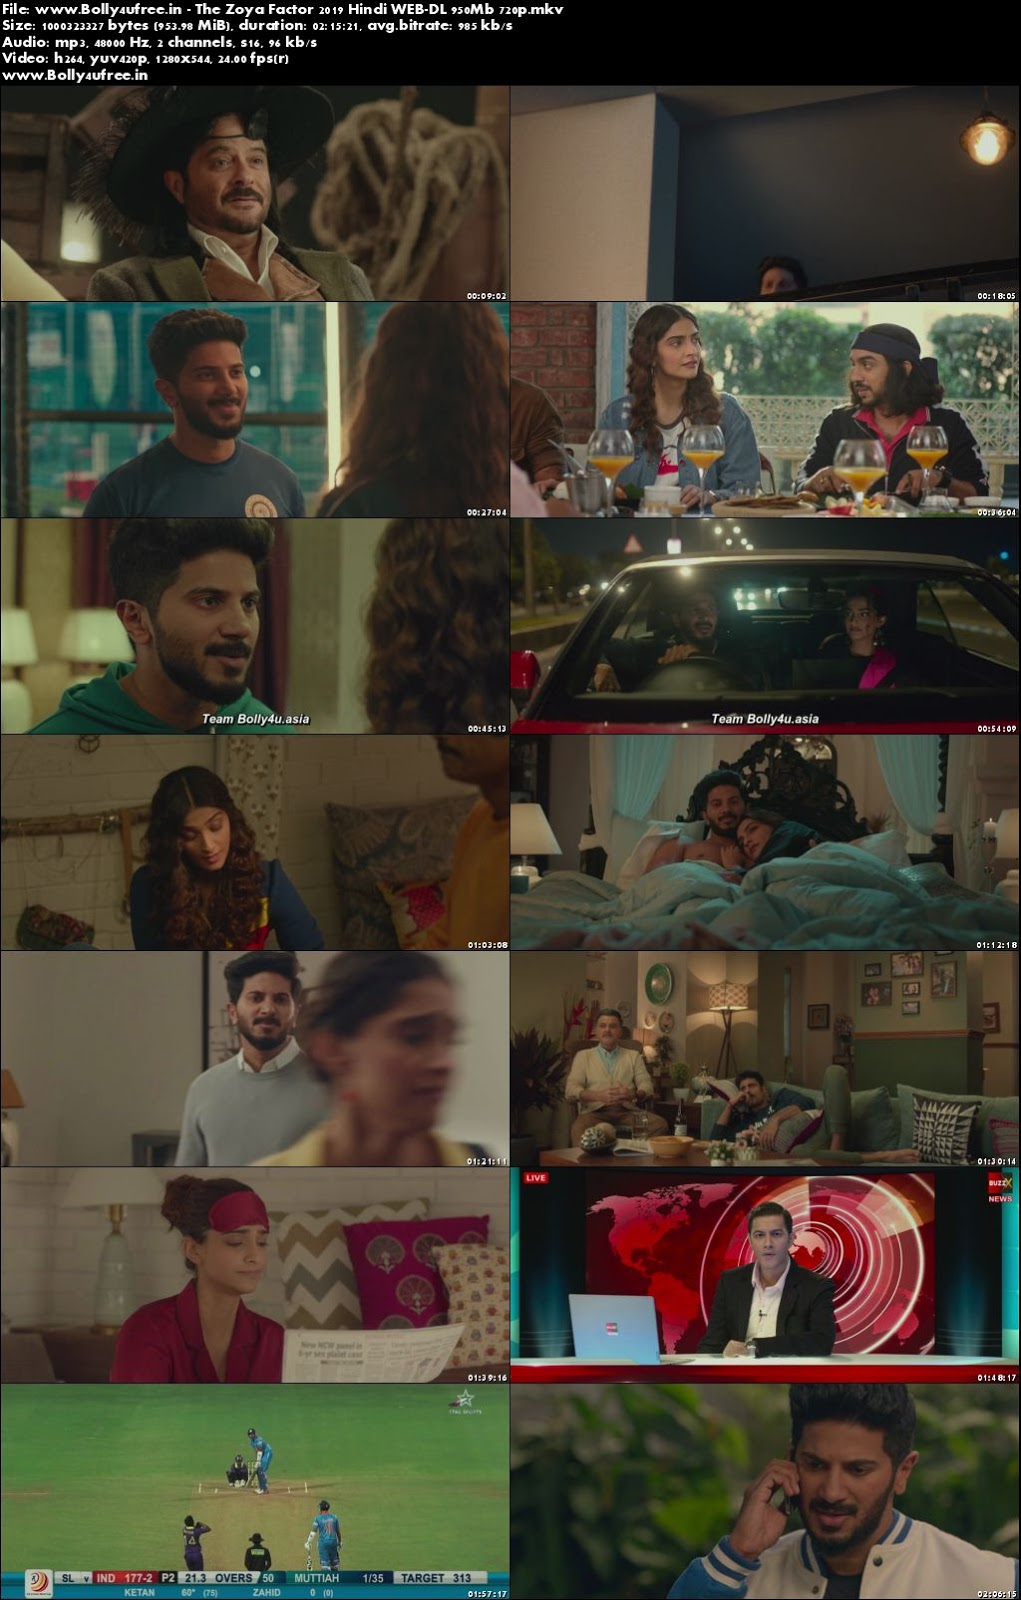 The Zoya Factor 2019 Hindi WEB-DL 400Mb 480p